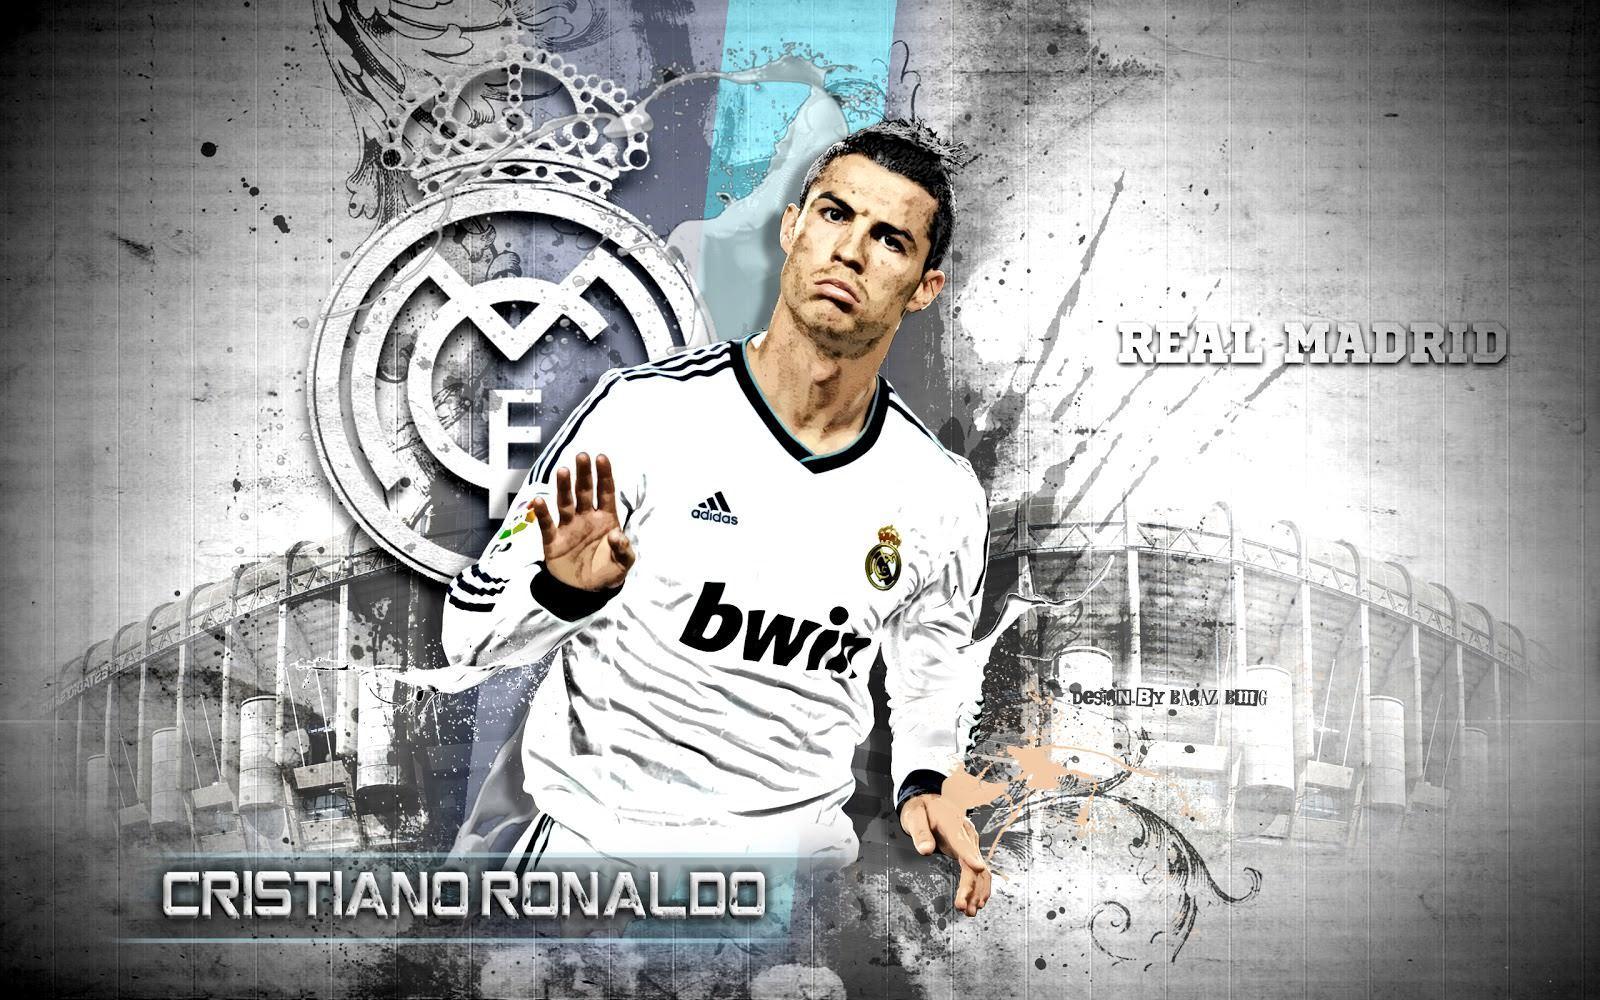 Cristiano Ronaldo Cool Wallpapers Top Free Cristiano Ronaldo